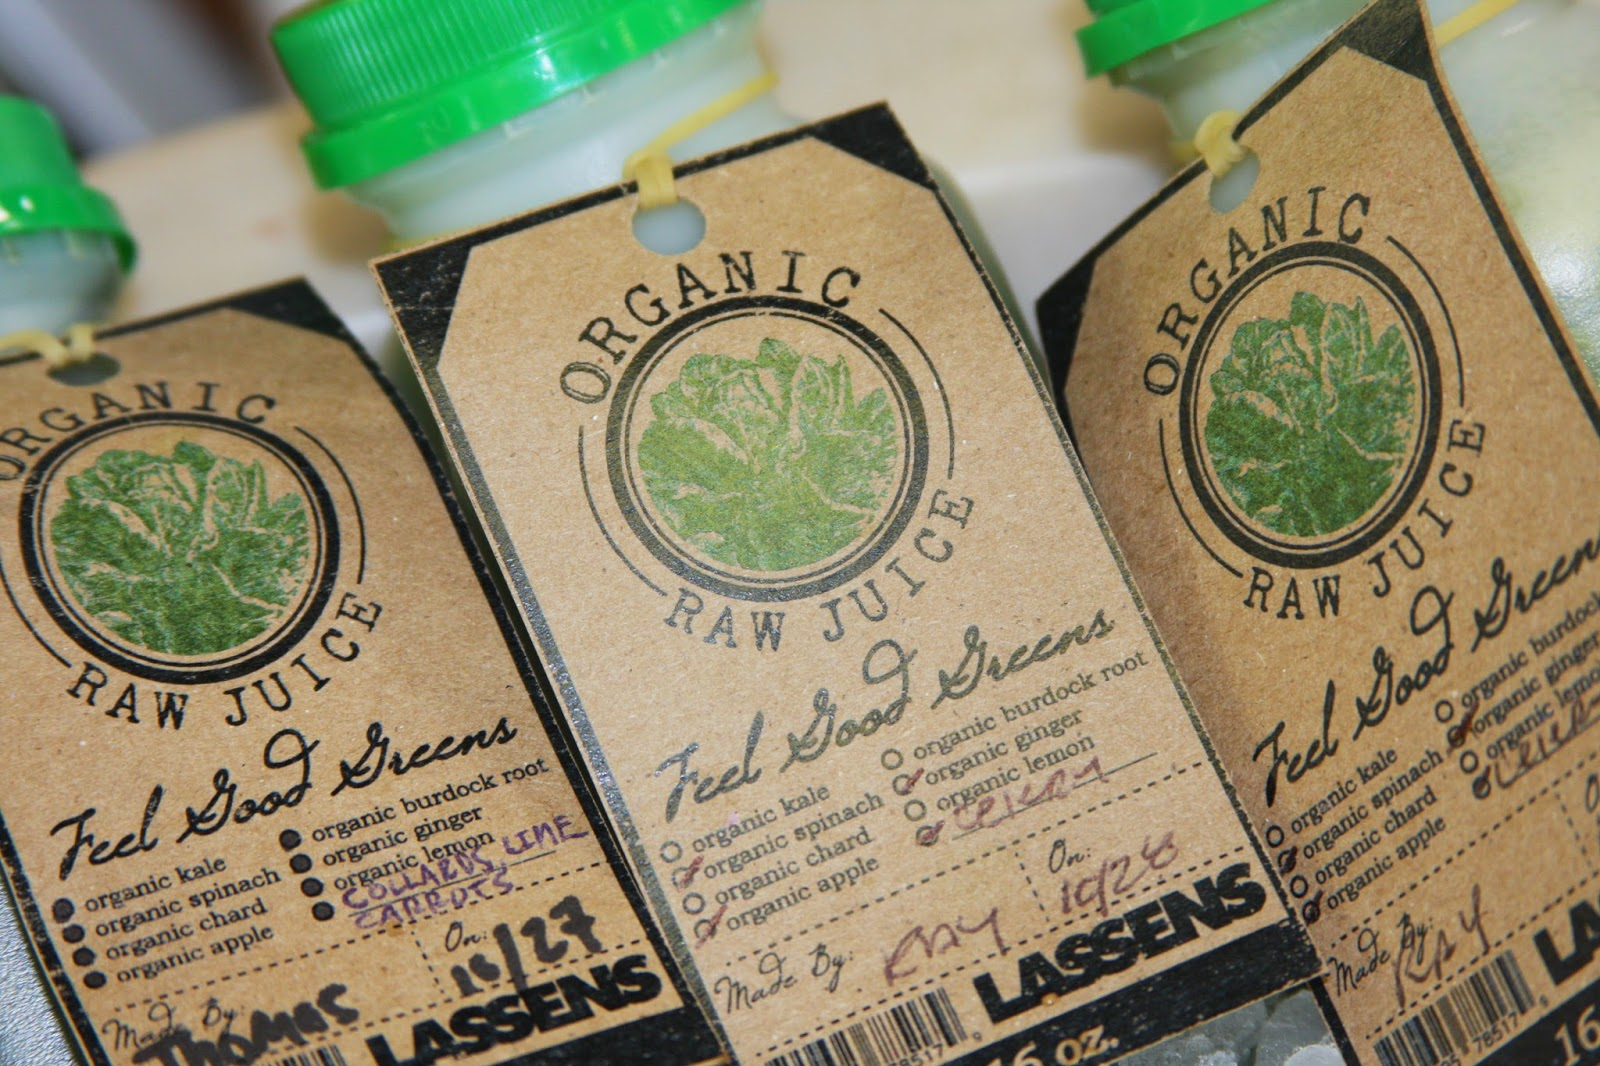 daily+greens, feel+good+greens, daily+juices, burdock+root, detox+juicing